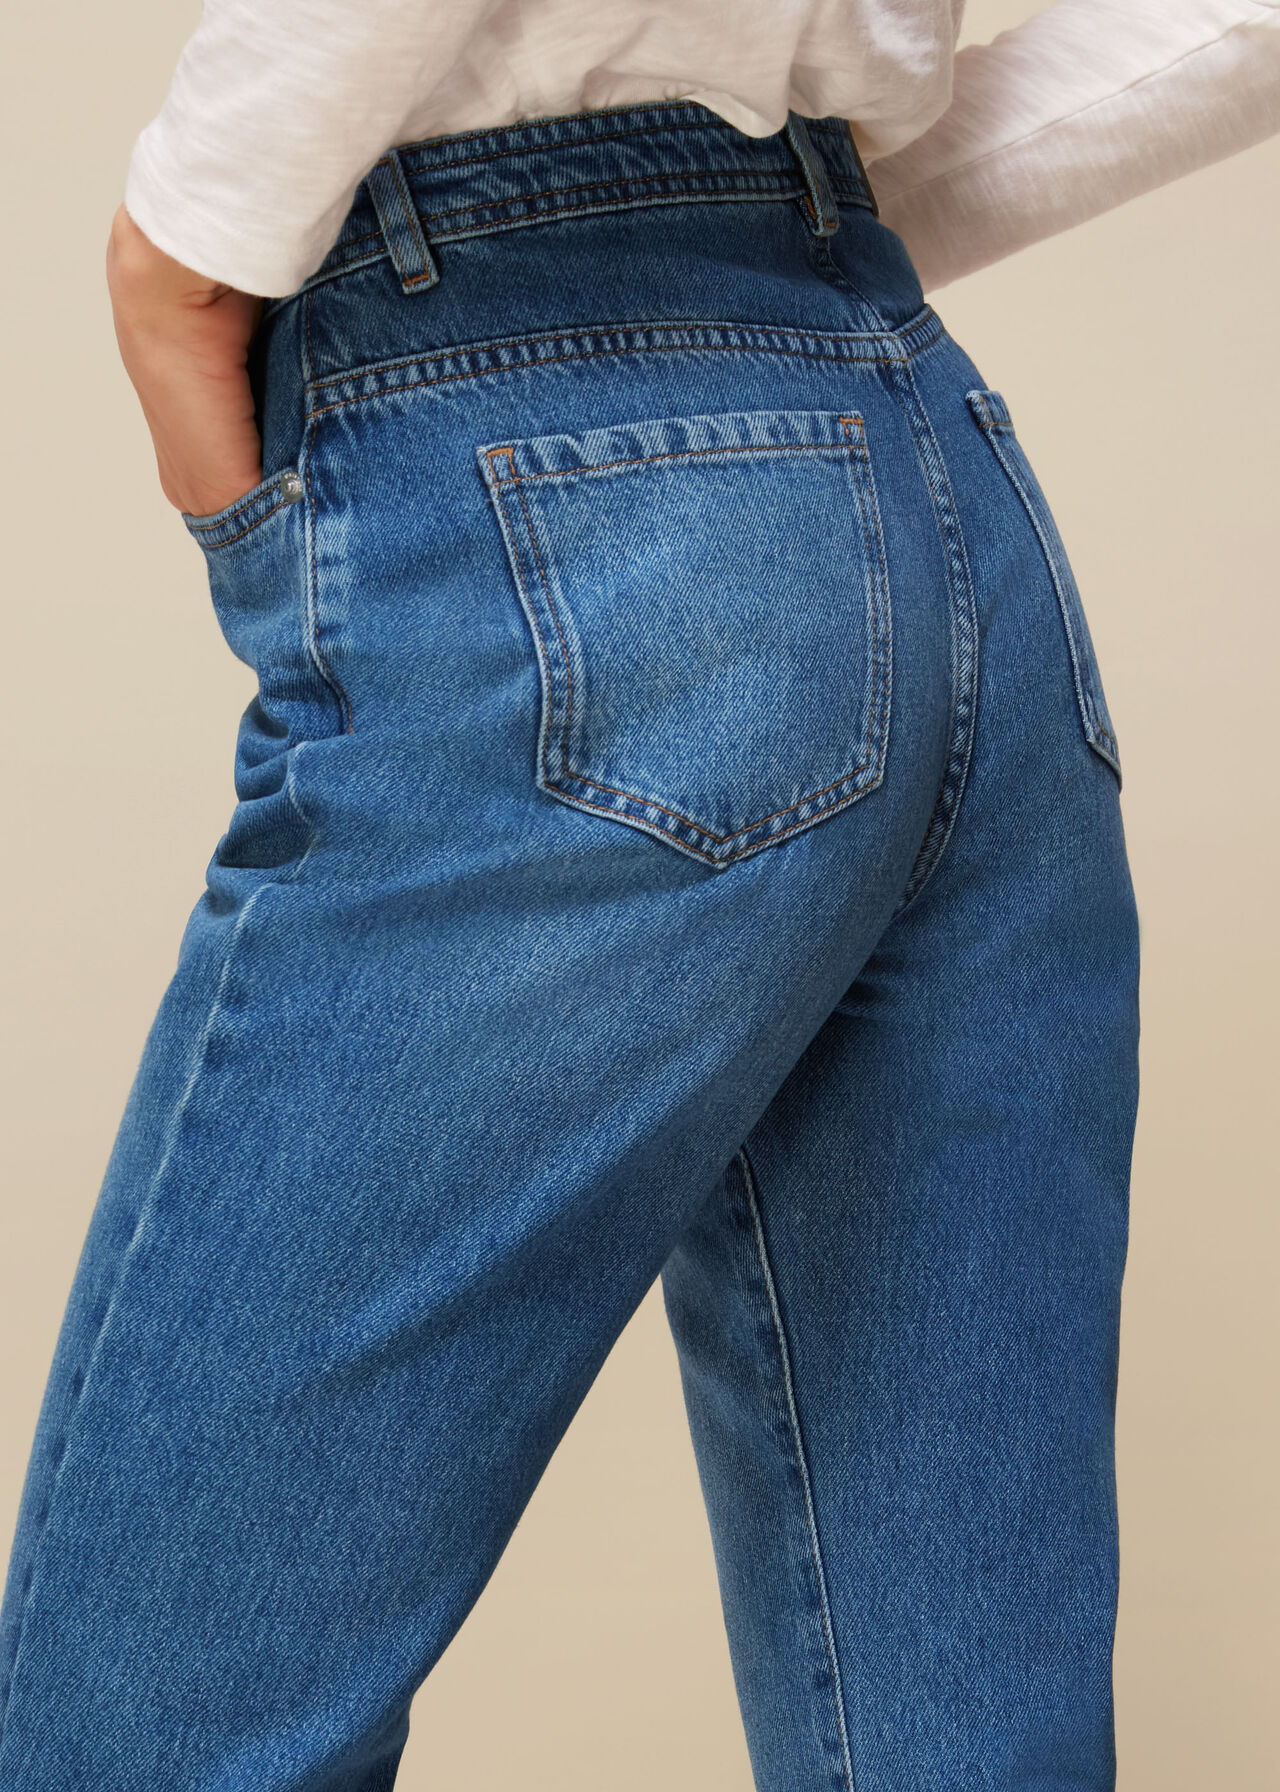 Authentic Kick Flare Jean